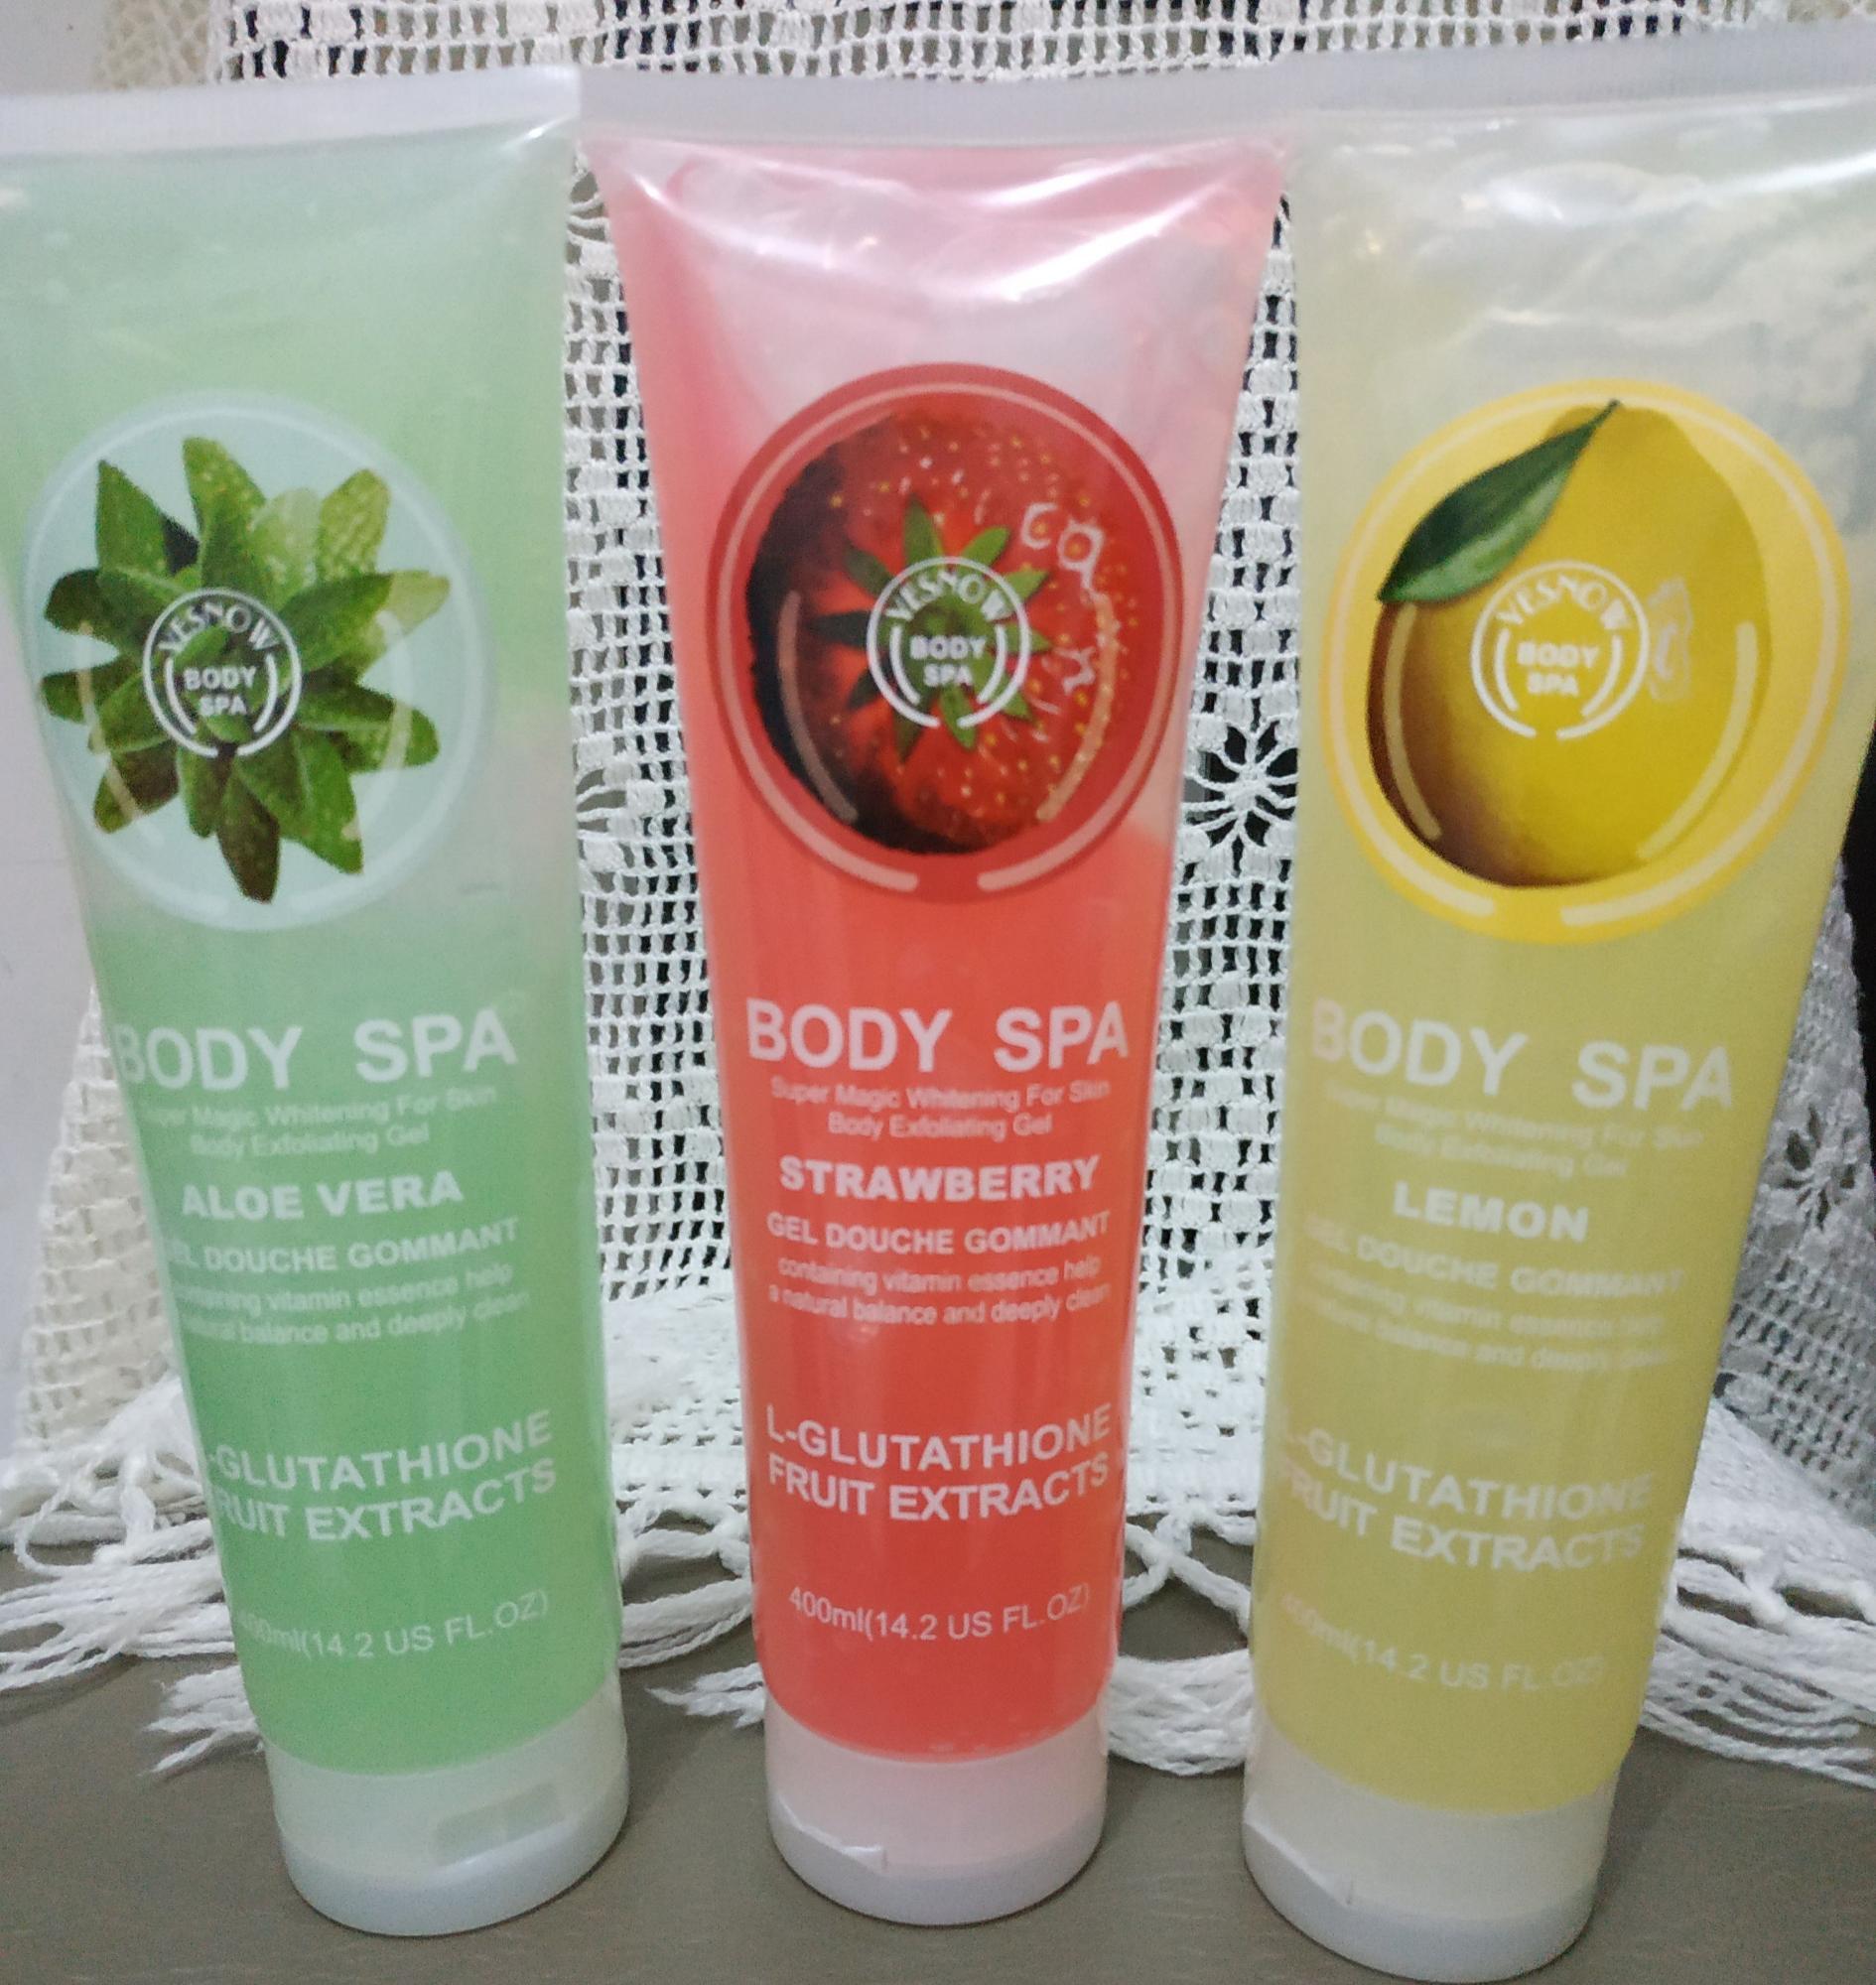 Jual Produk Yesnow Online Terbaru Di Body Spa Scrub Peeling Gel Shop Perontok Daki Bodyspa